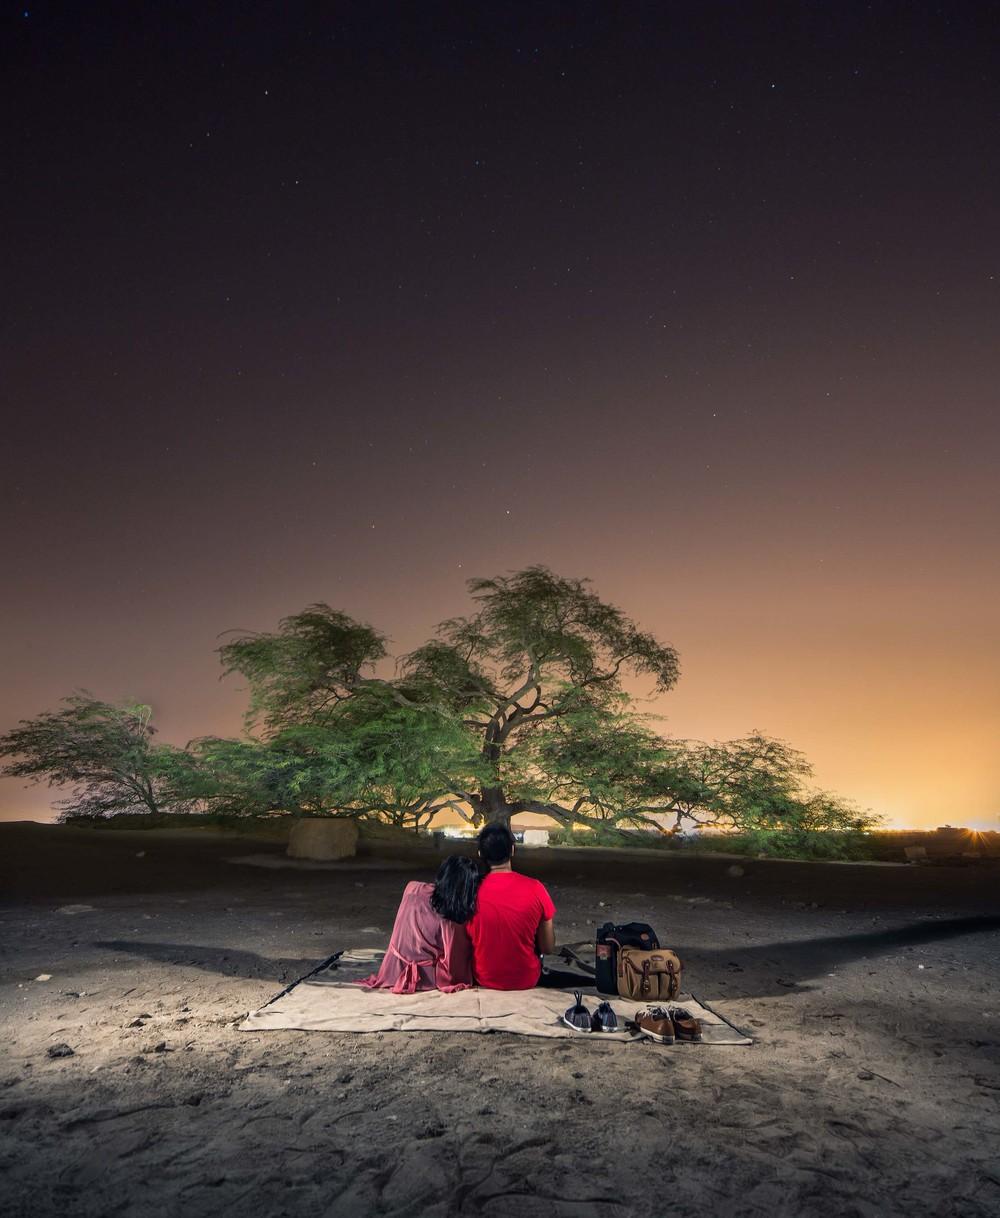 Tree-of-Life-panorama-final-edits.jpg